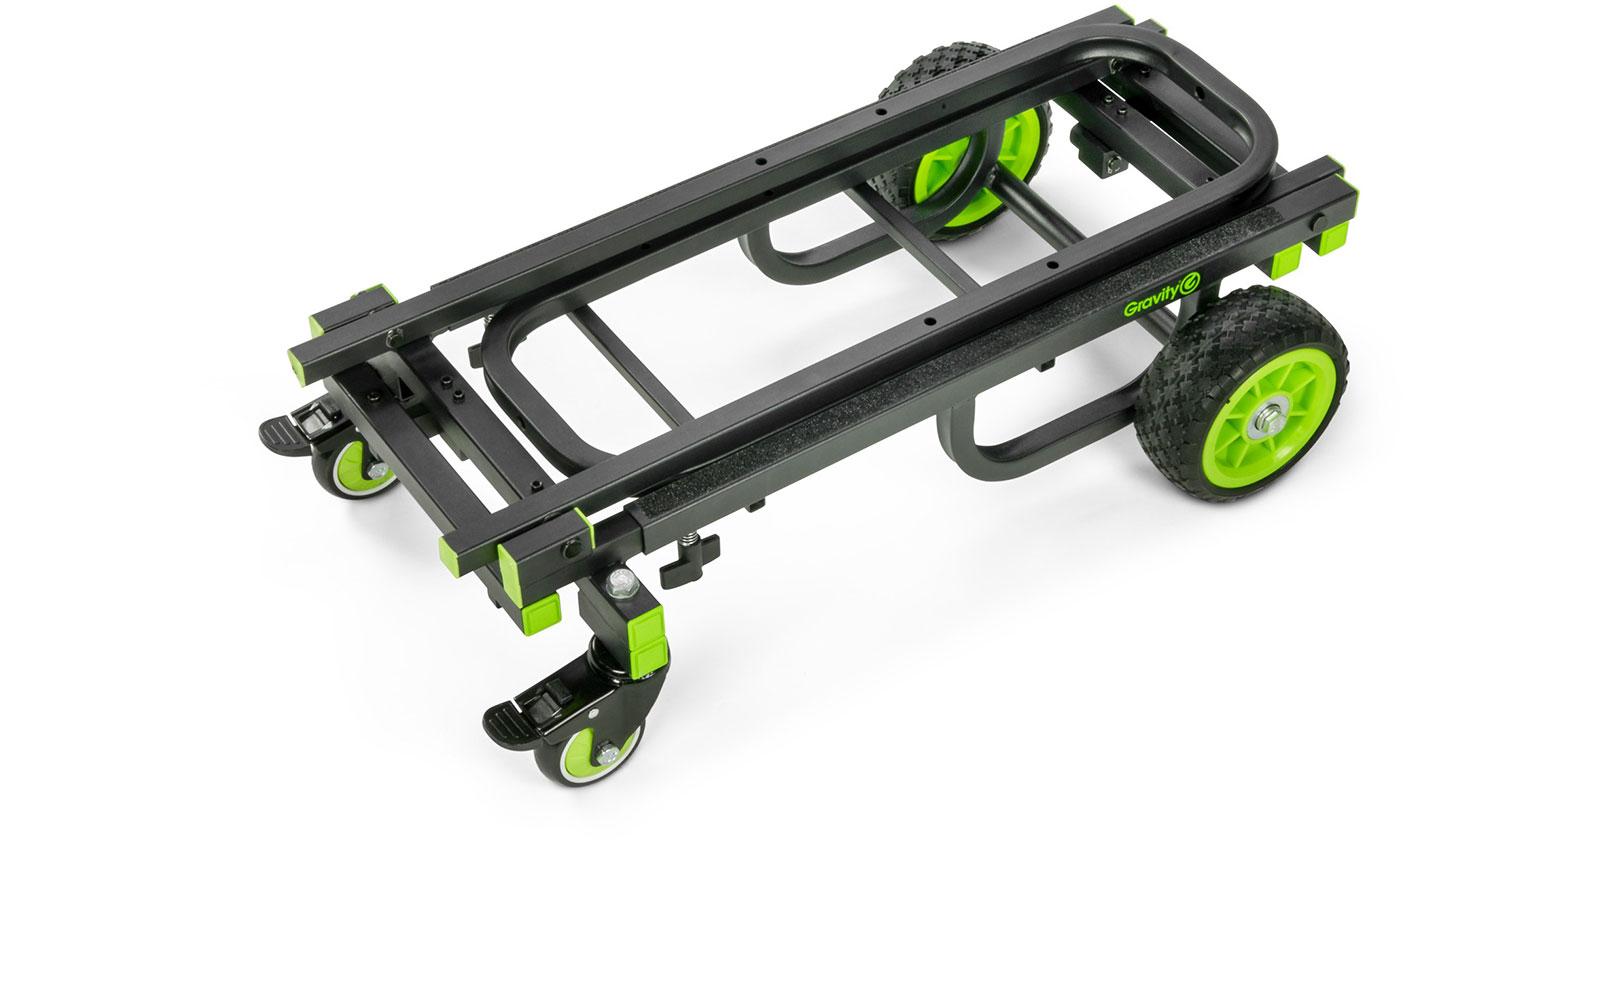 gravity-cart-m-01-b-multifunktionswagen-mittel-